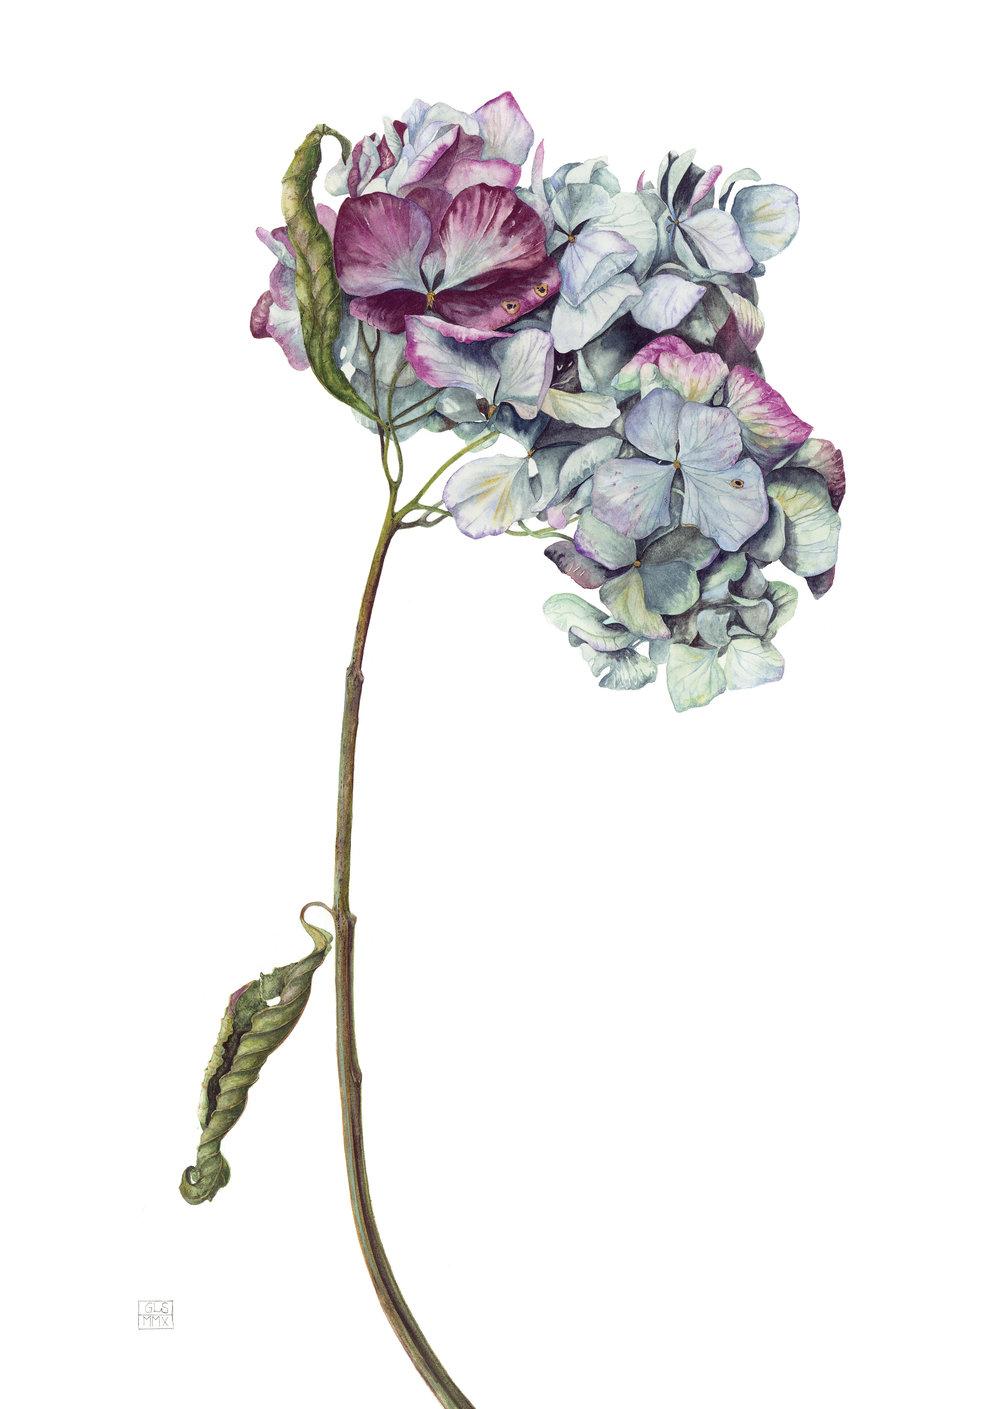 Hydrangea Macrophylla 'Renate Steiniger'  watercolour on paper  30 x 43 cm image  53 x 68 cm framed  £1800